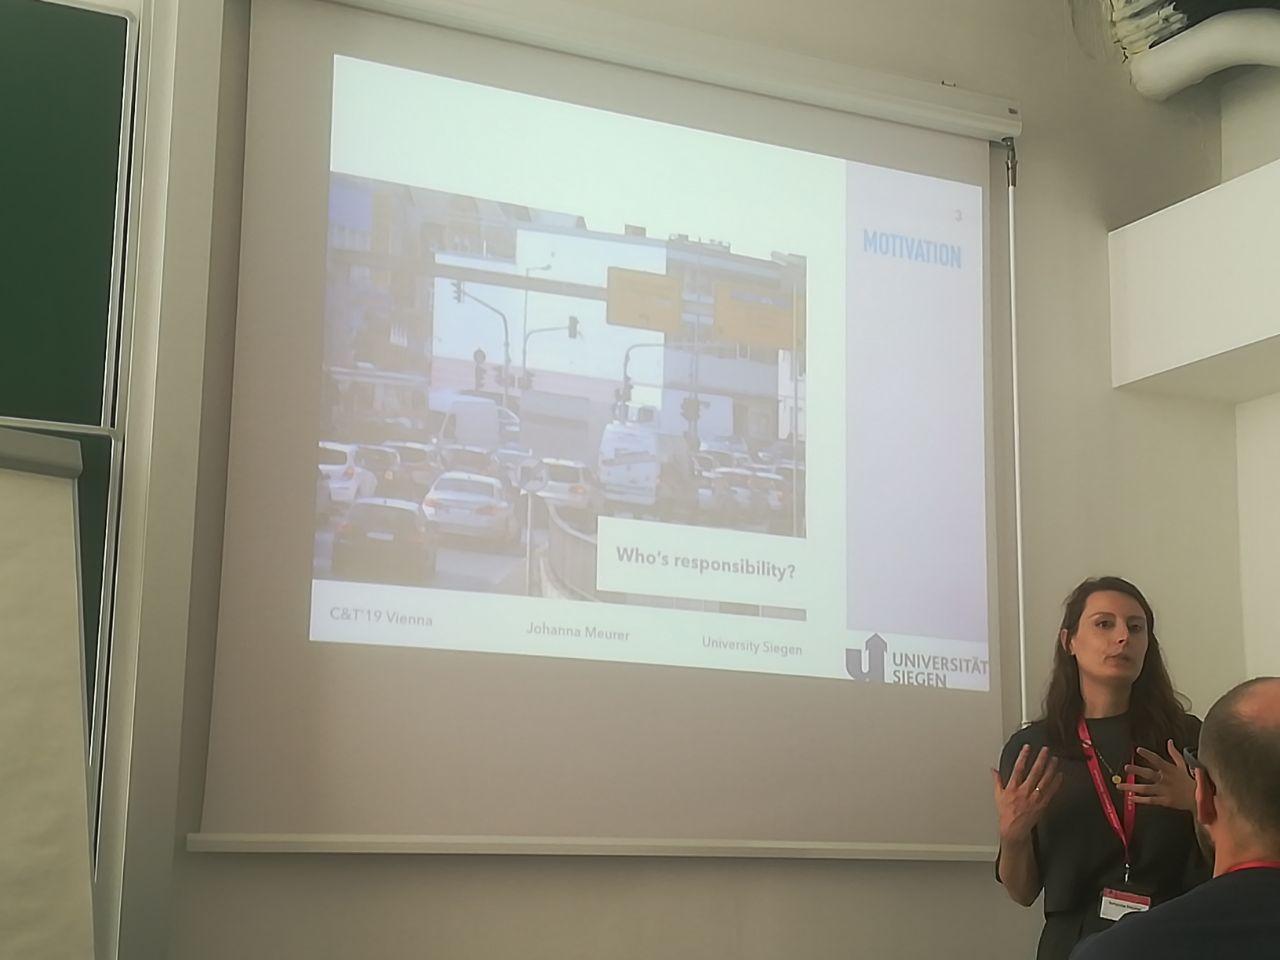 Johanna Meurer, on designing for sustainable mobility using mobile phone data